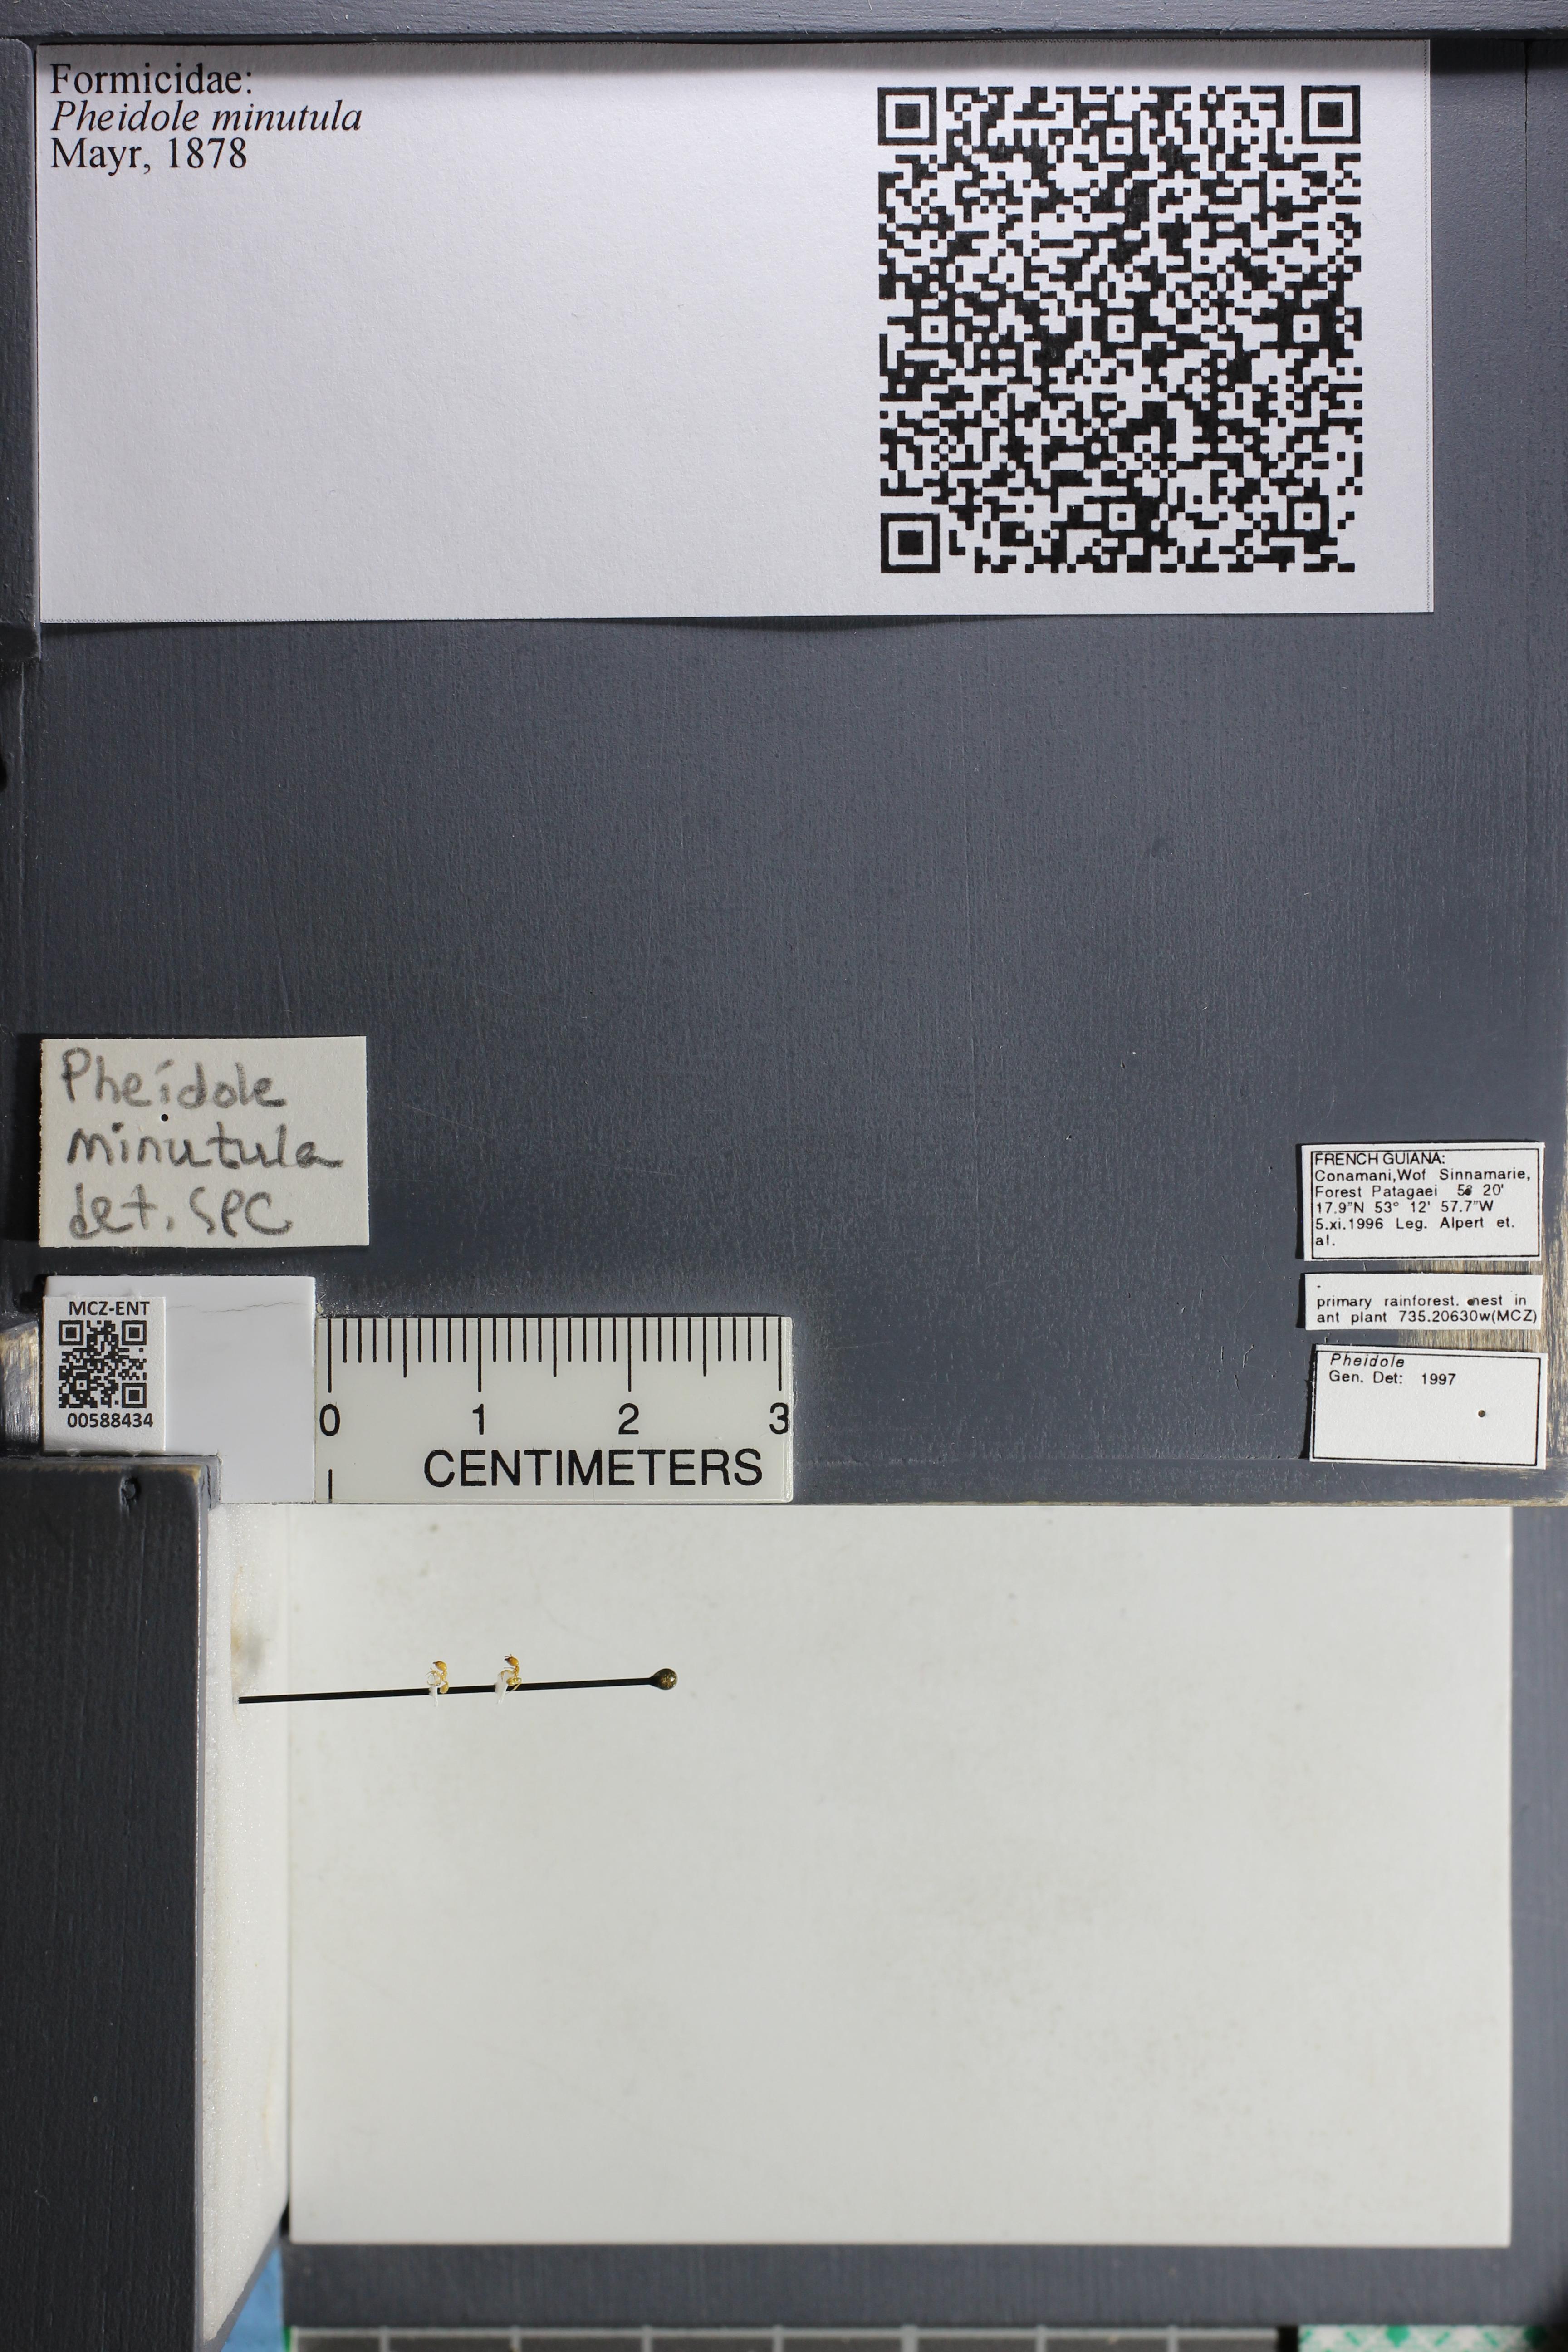 Media of type image, MCZ:Ent:588434 Identified as Pheidole minutula.